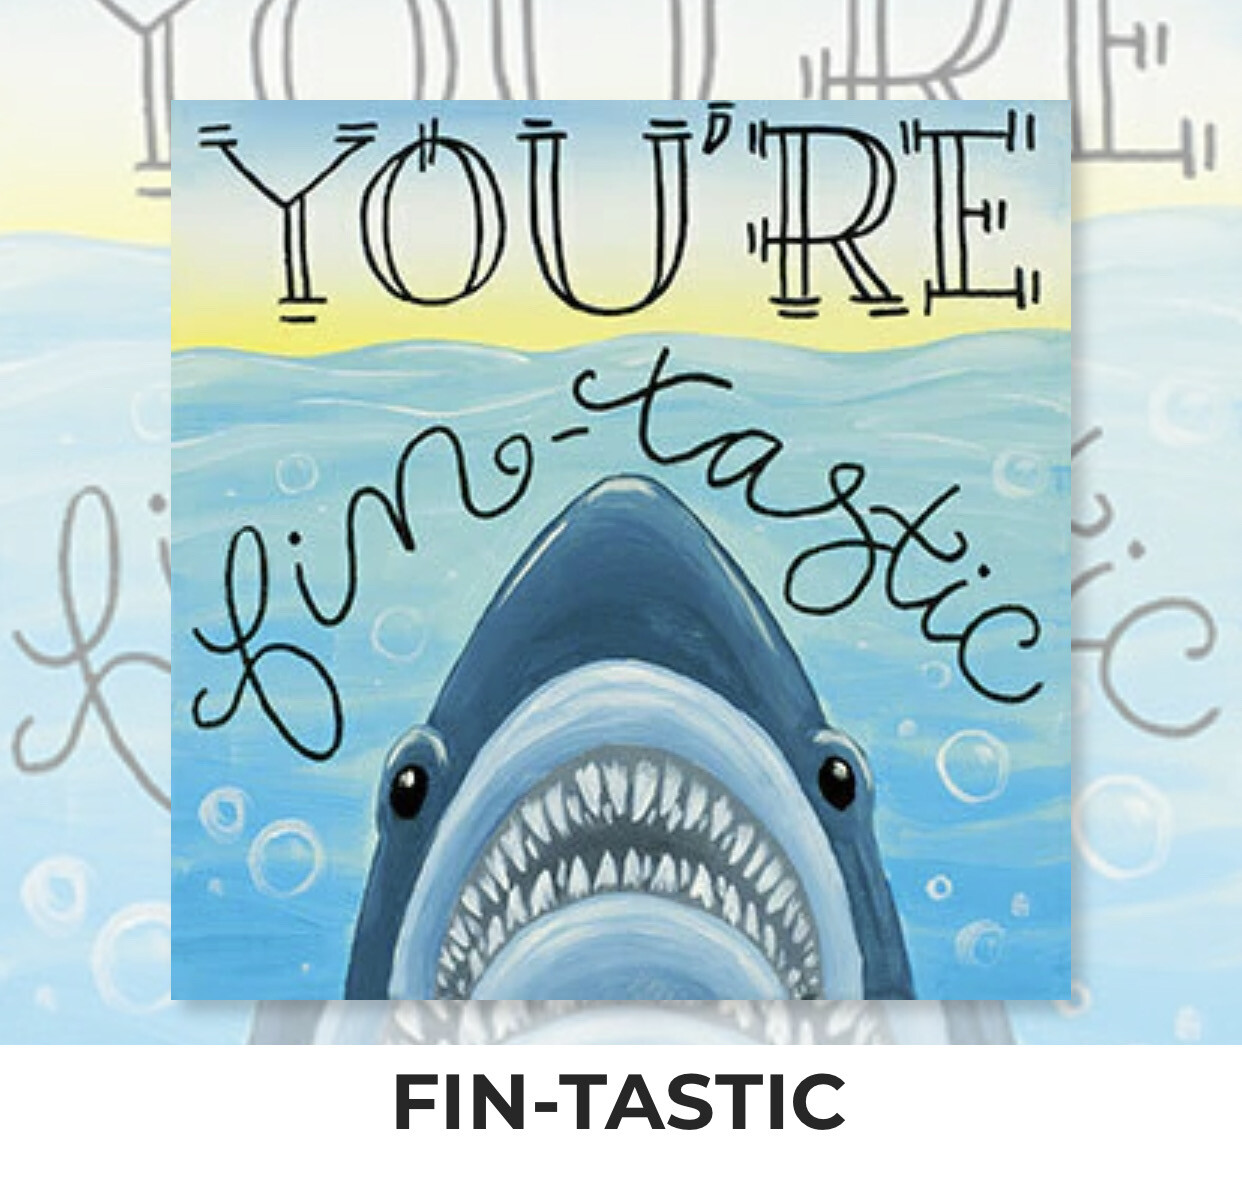 You're Fin-tastic - Shark KIDS Acrylic Paint On Canvas DIY Art Kit